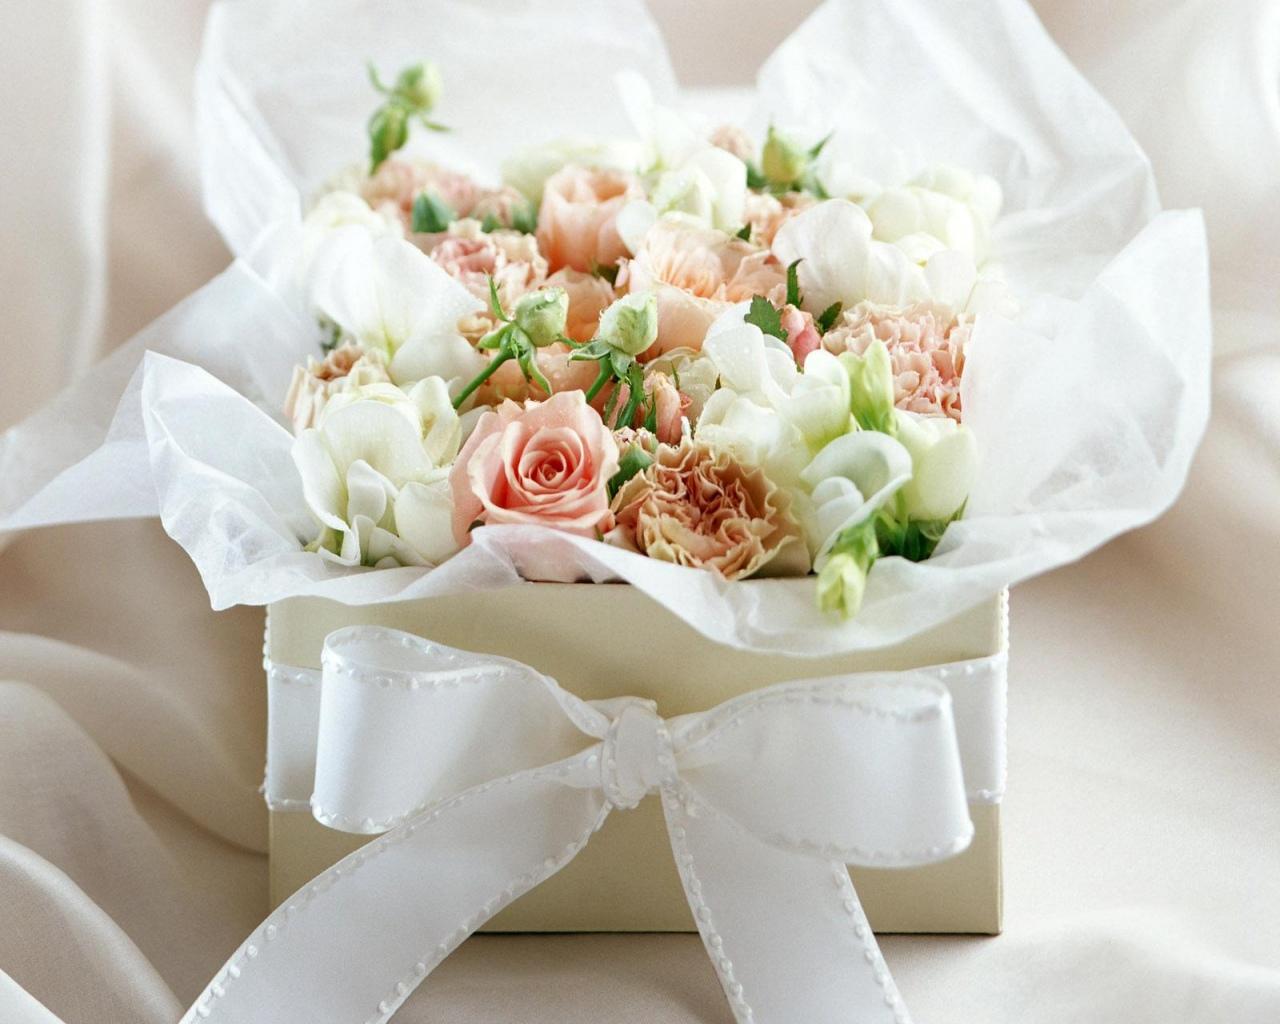 http://4.bp.blogspot.com/_RcETiEfxCIQ/TKSDdxsJCaI/AAAAAAAAAGw/gXTi53xaBXY/s1600/white_rose_flowers-normal5.4.jpg